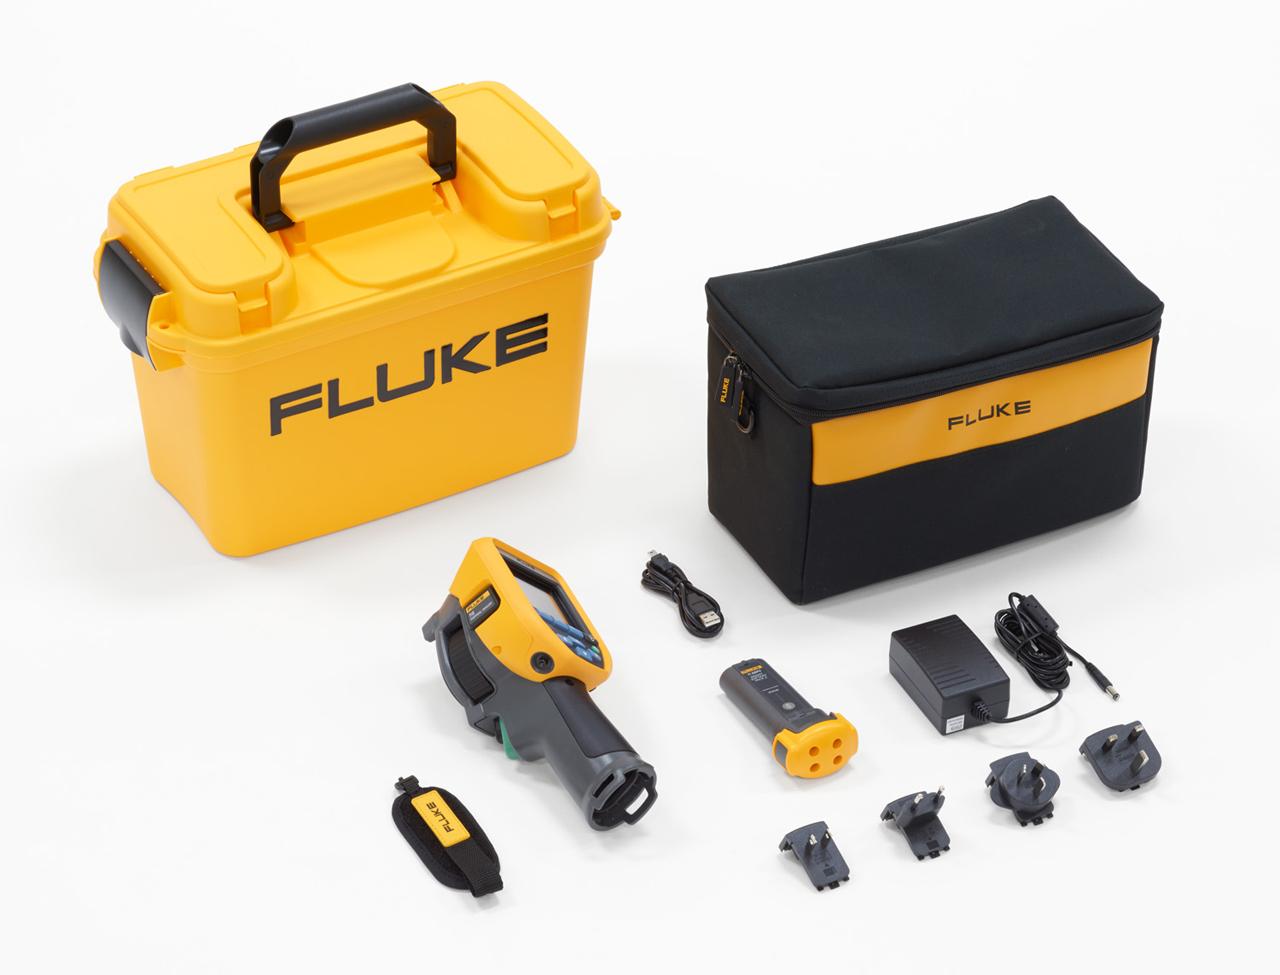 FLUKE TIS45 9Hz - Thermal Imager – Manual Focus (19,200 Pixels)